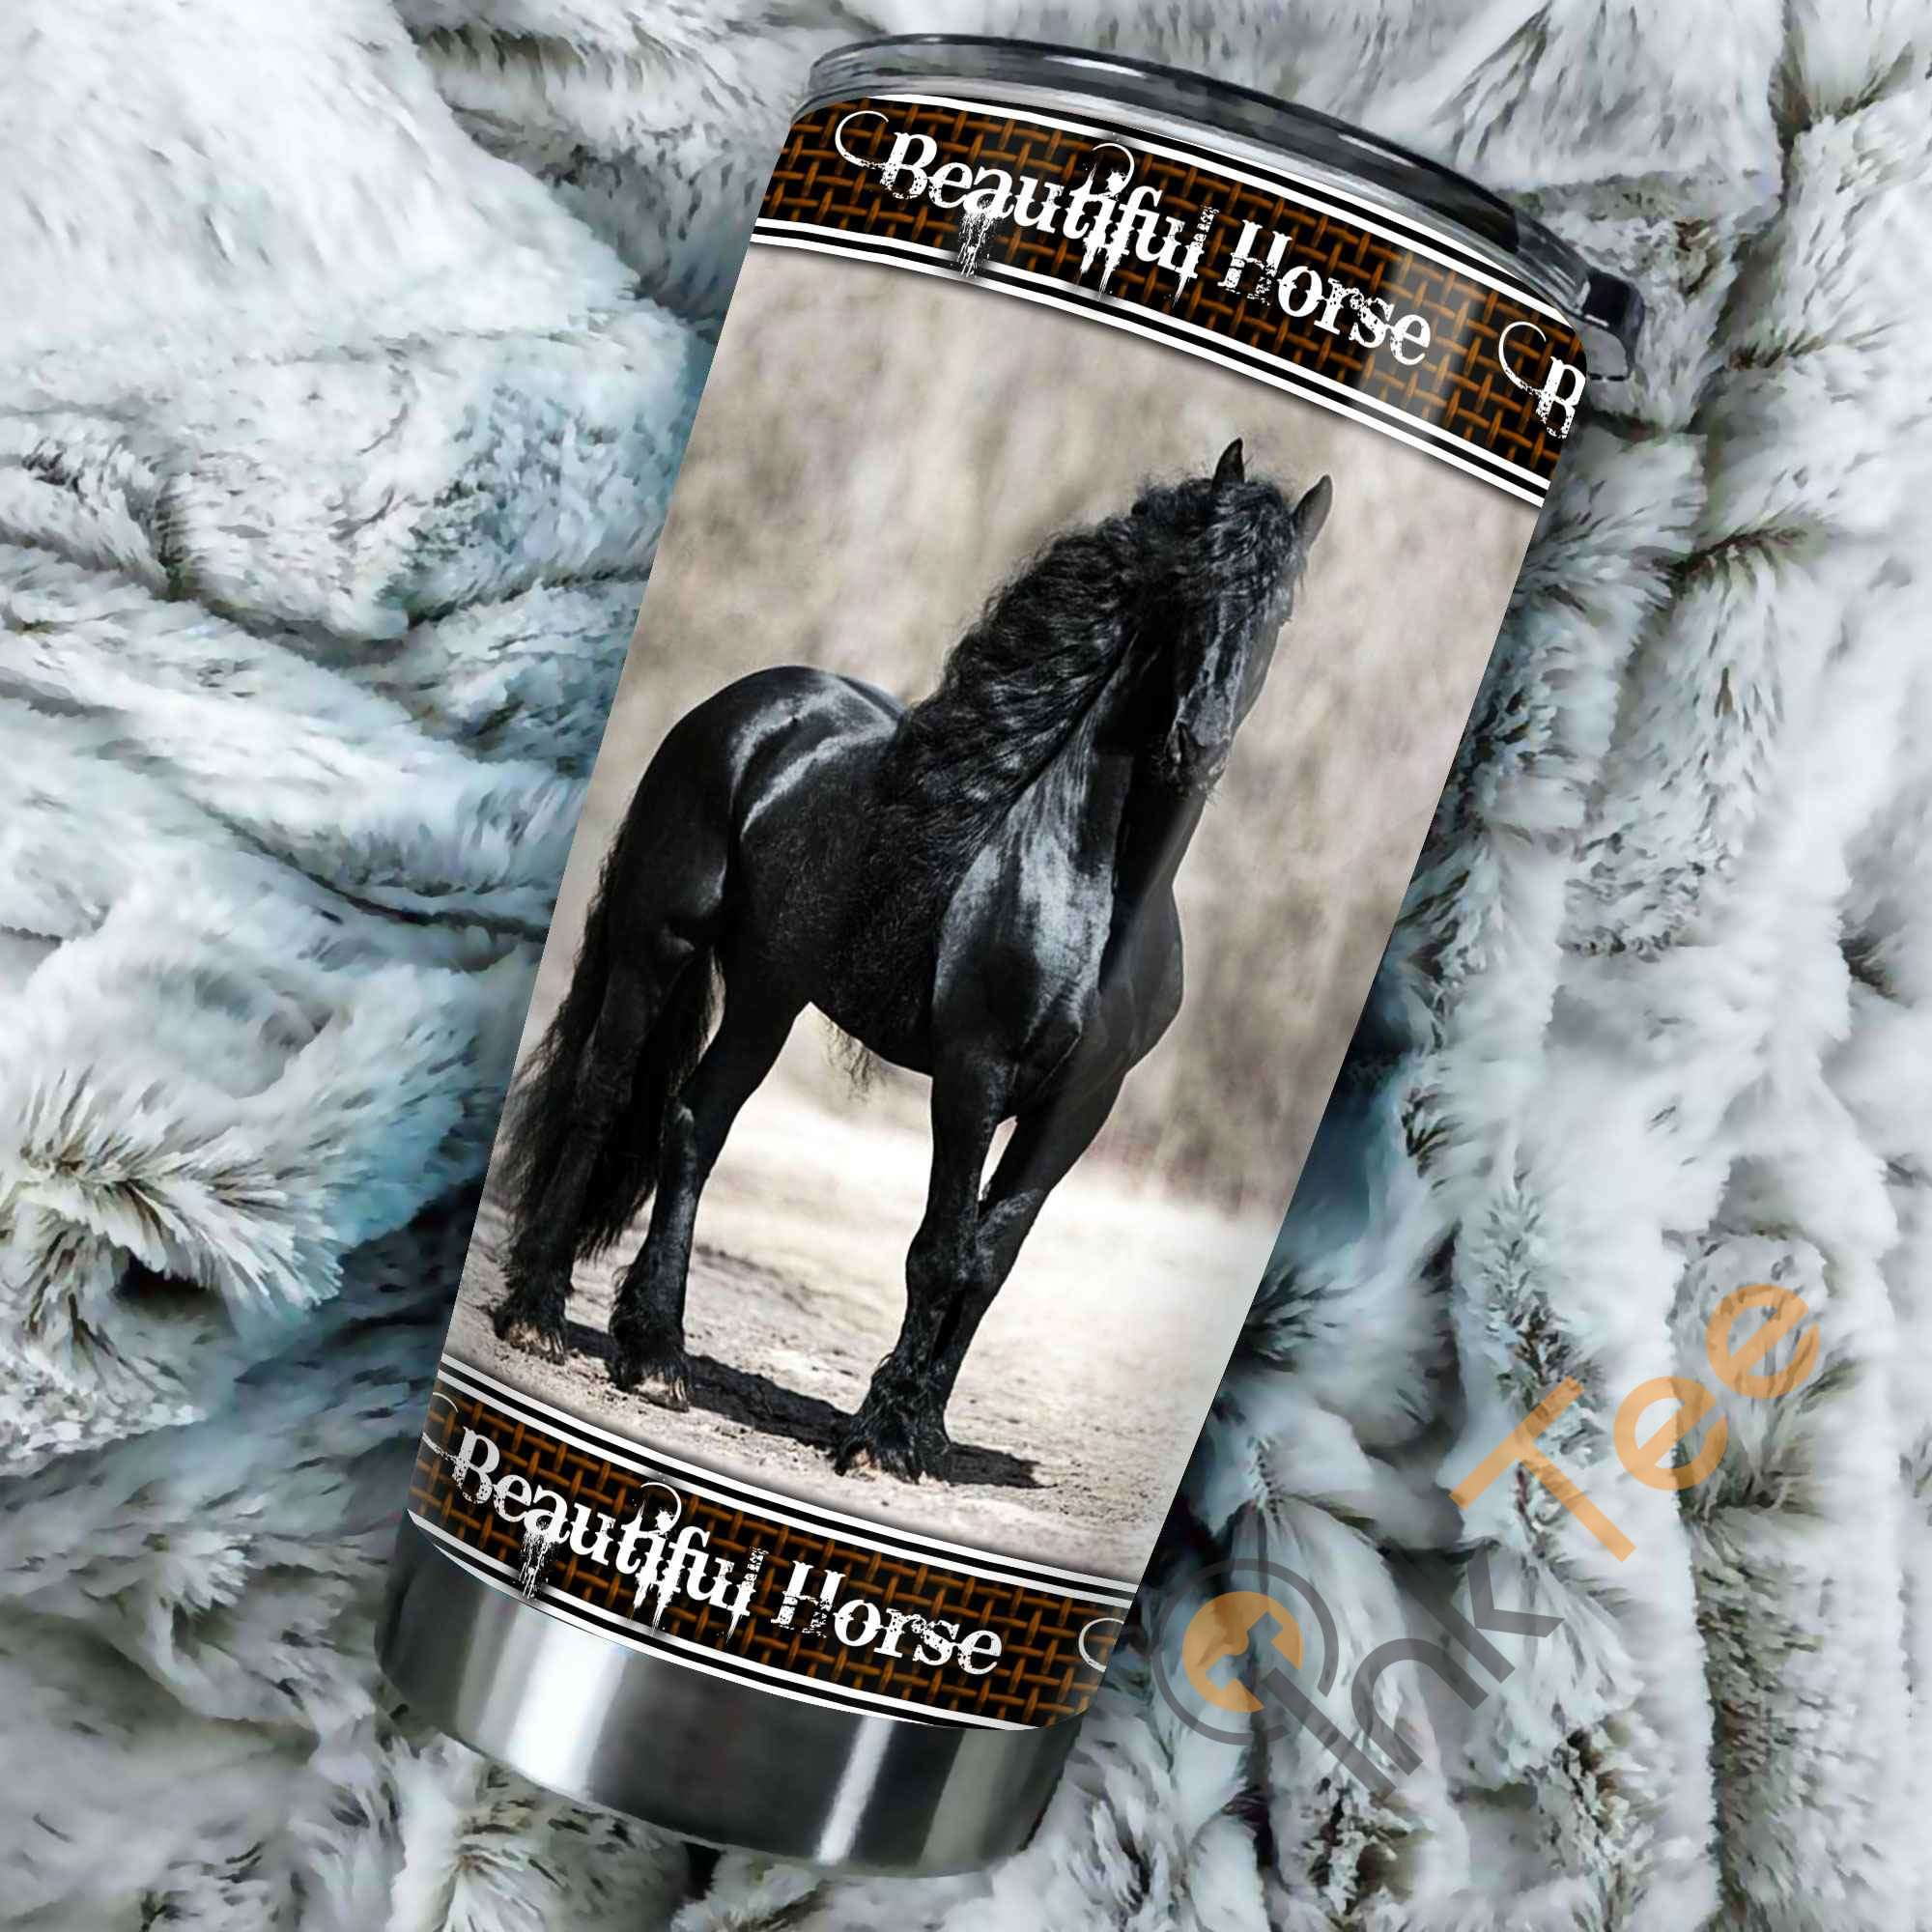 Beautiful Horse Amazon Best Seller Sku 3509 Stainless Steel Tumbler